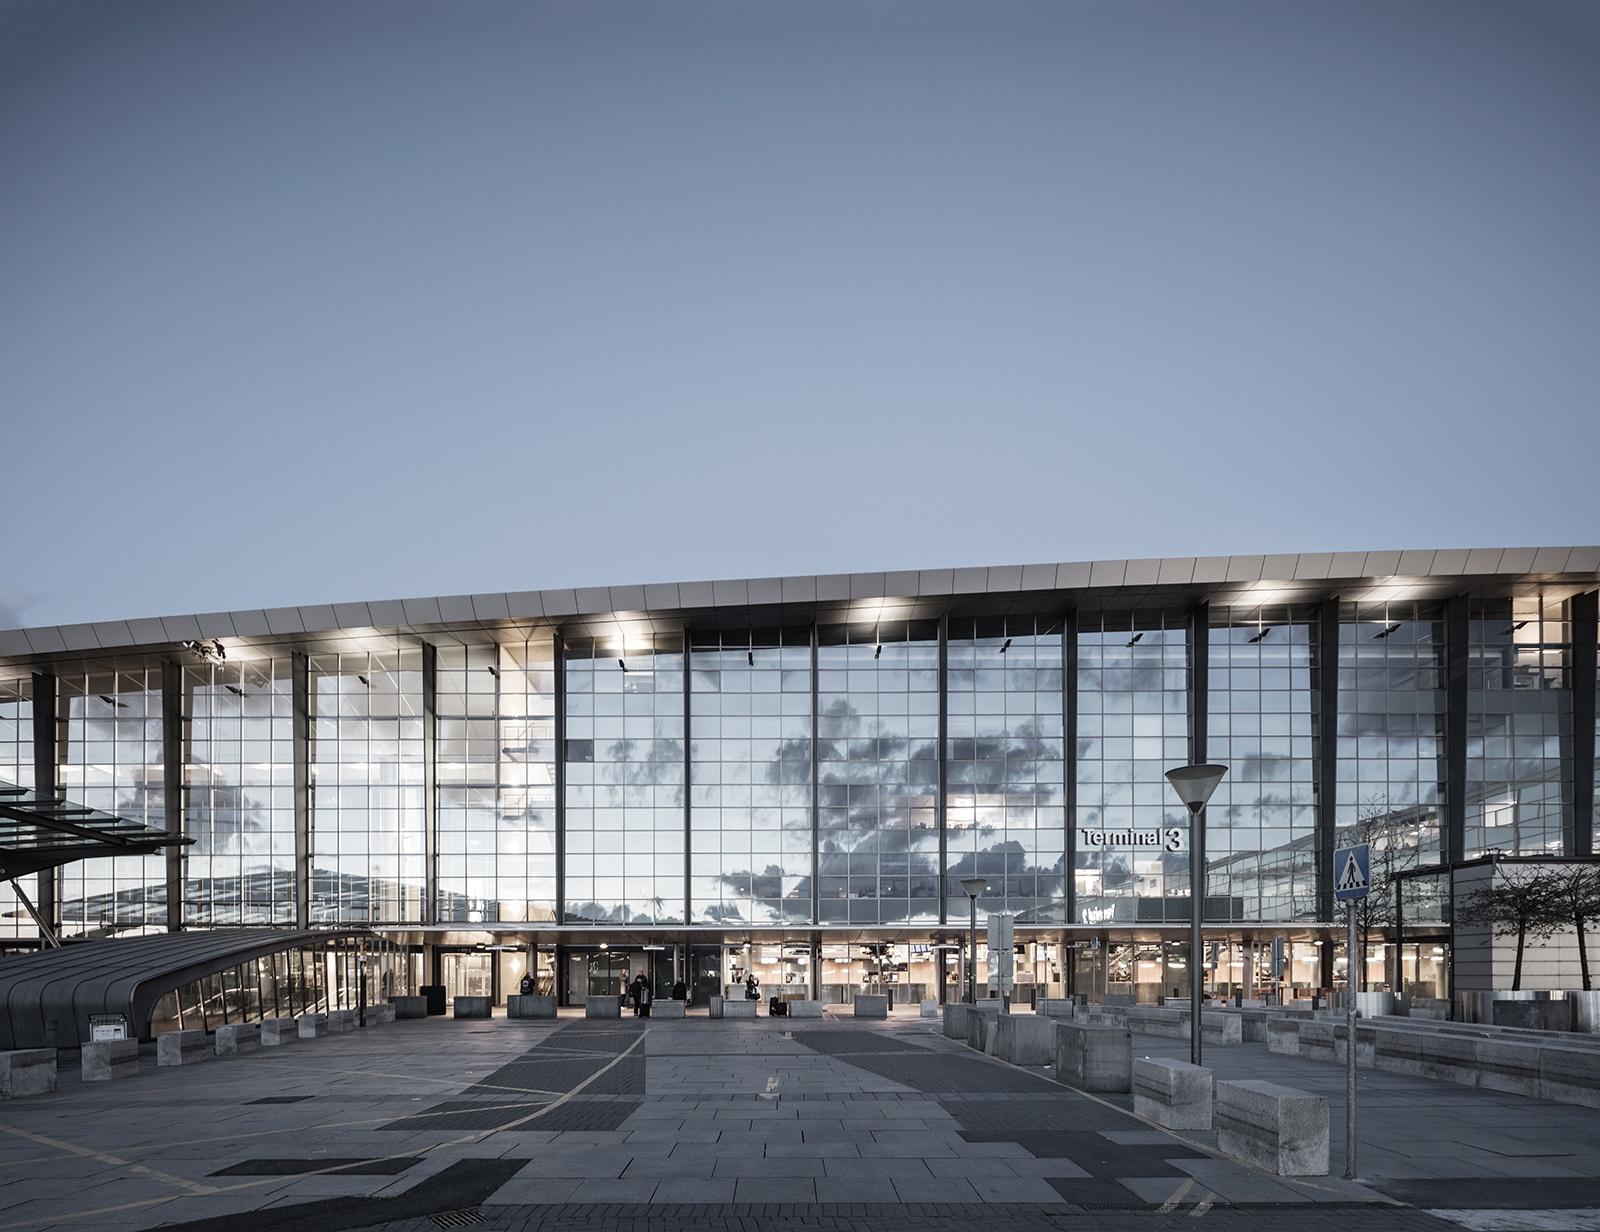 R_Hjortshoj - Terminal 3-91_1600